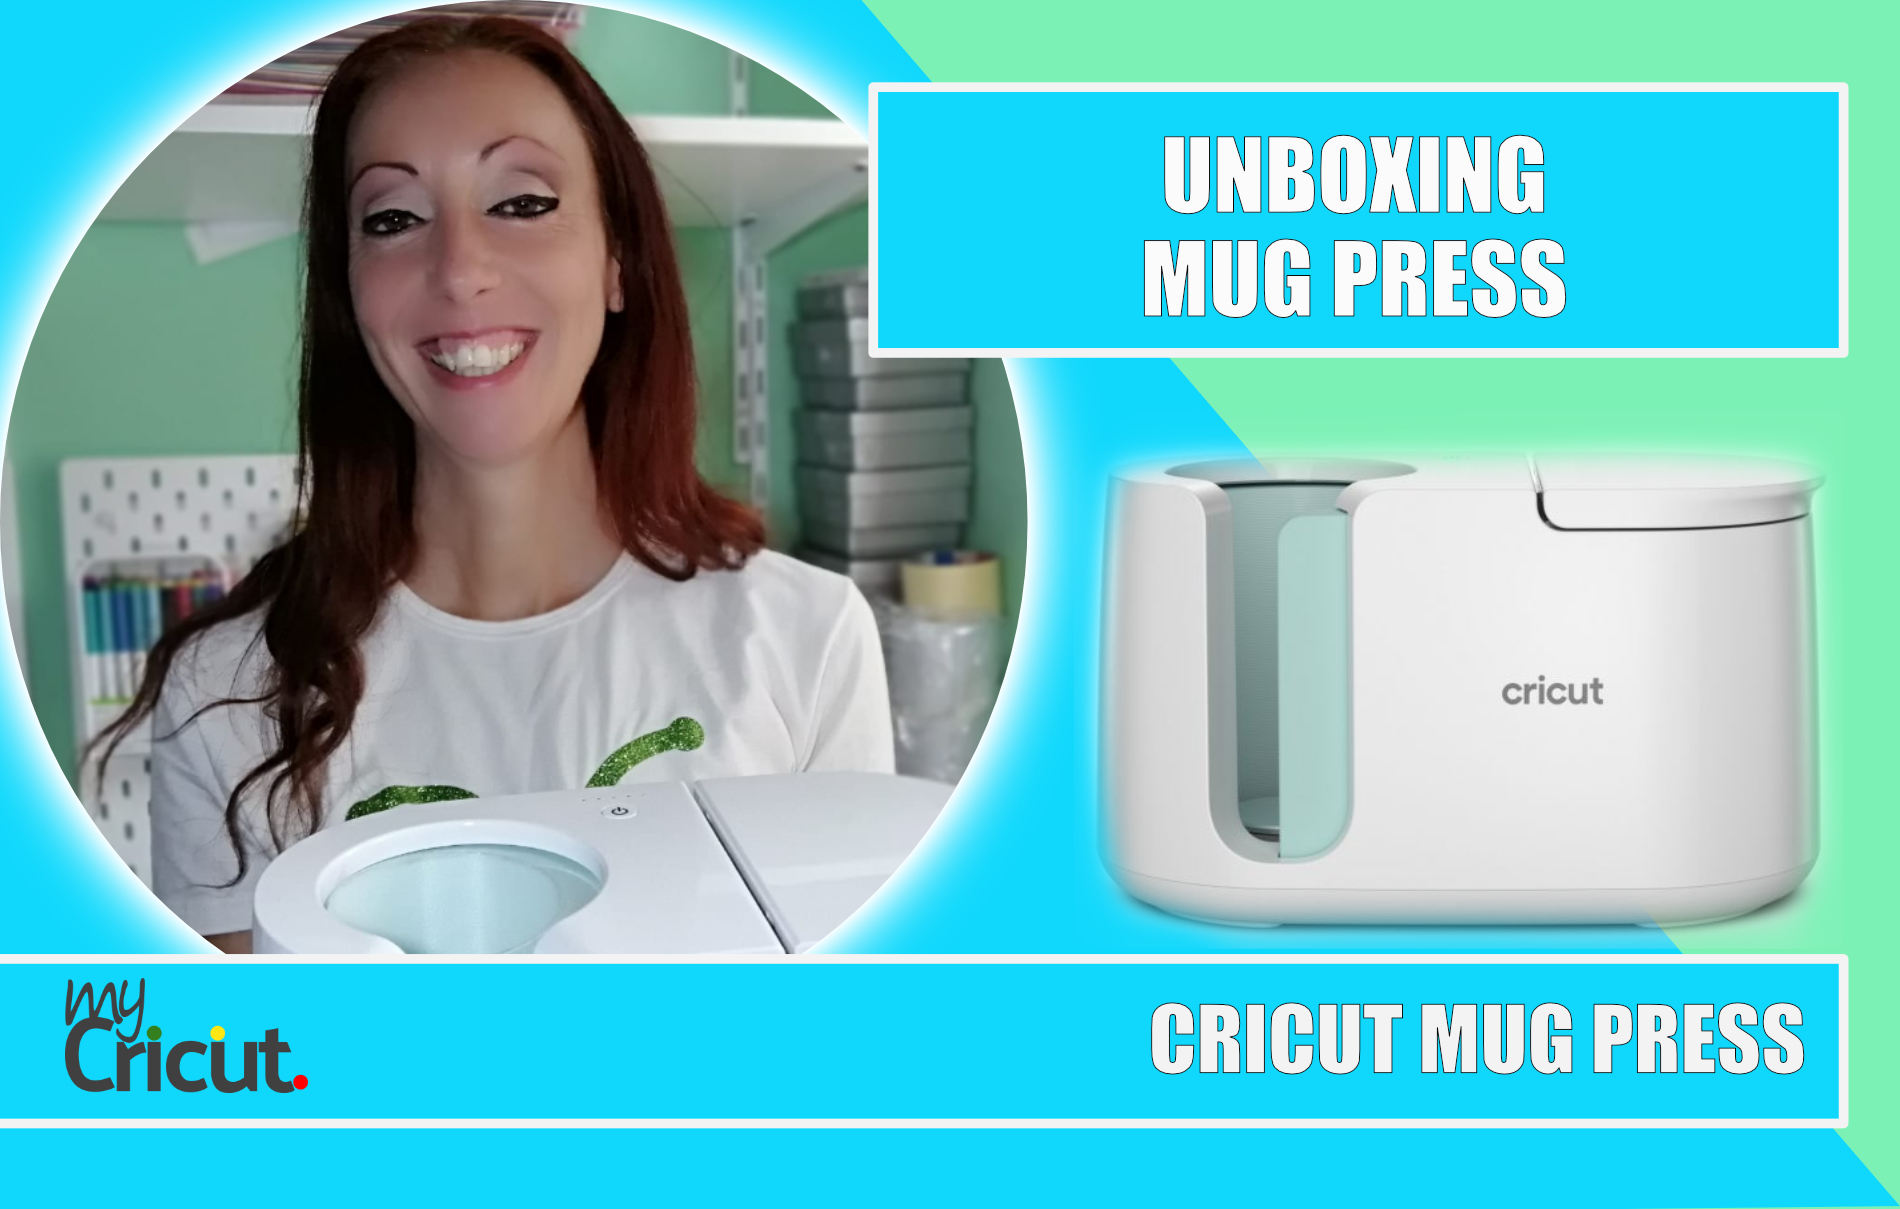 UNBOXING CRICUT MUG PRESS